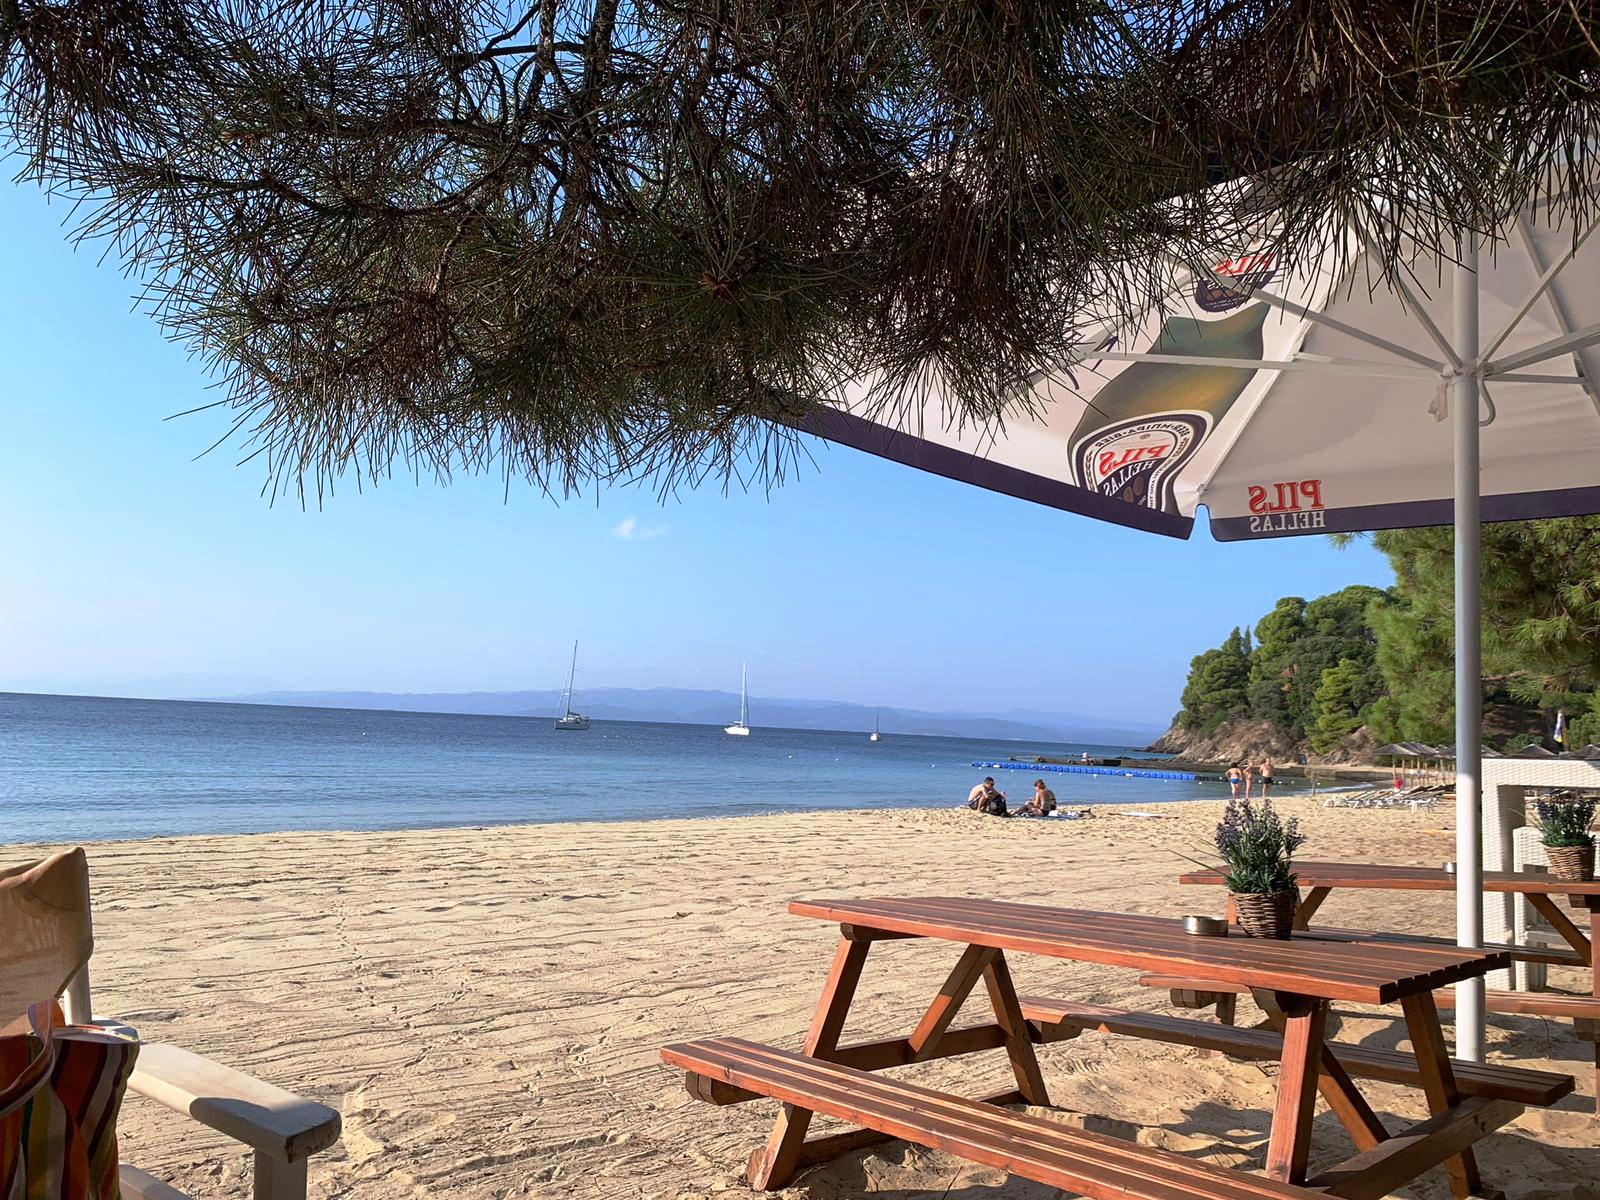 Vacanţa turiştilor în Skiathos, foto @ANCAPAVEL.RO